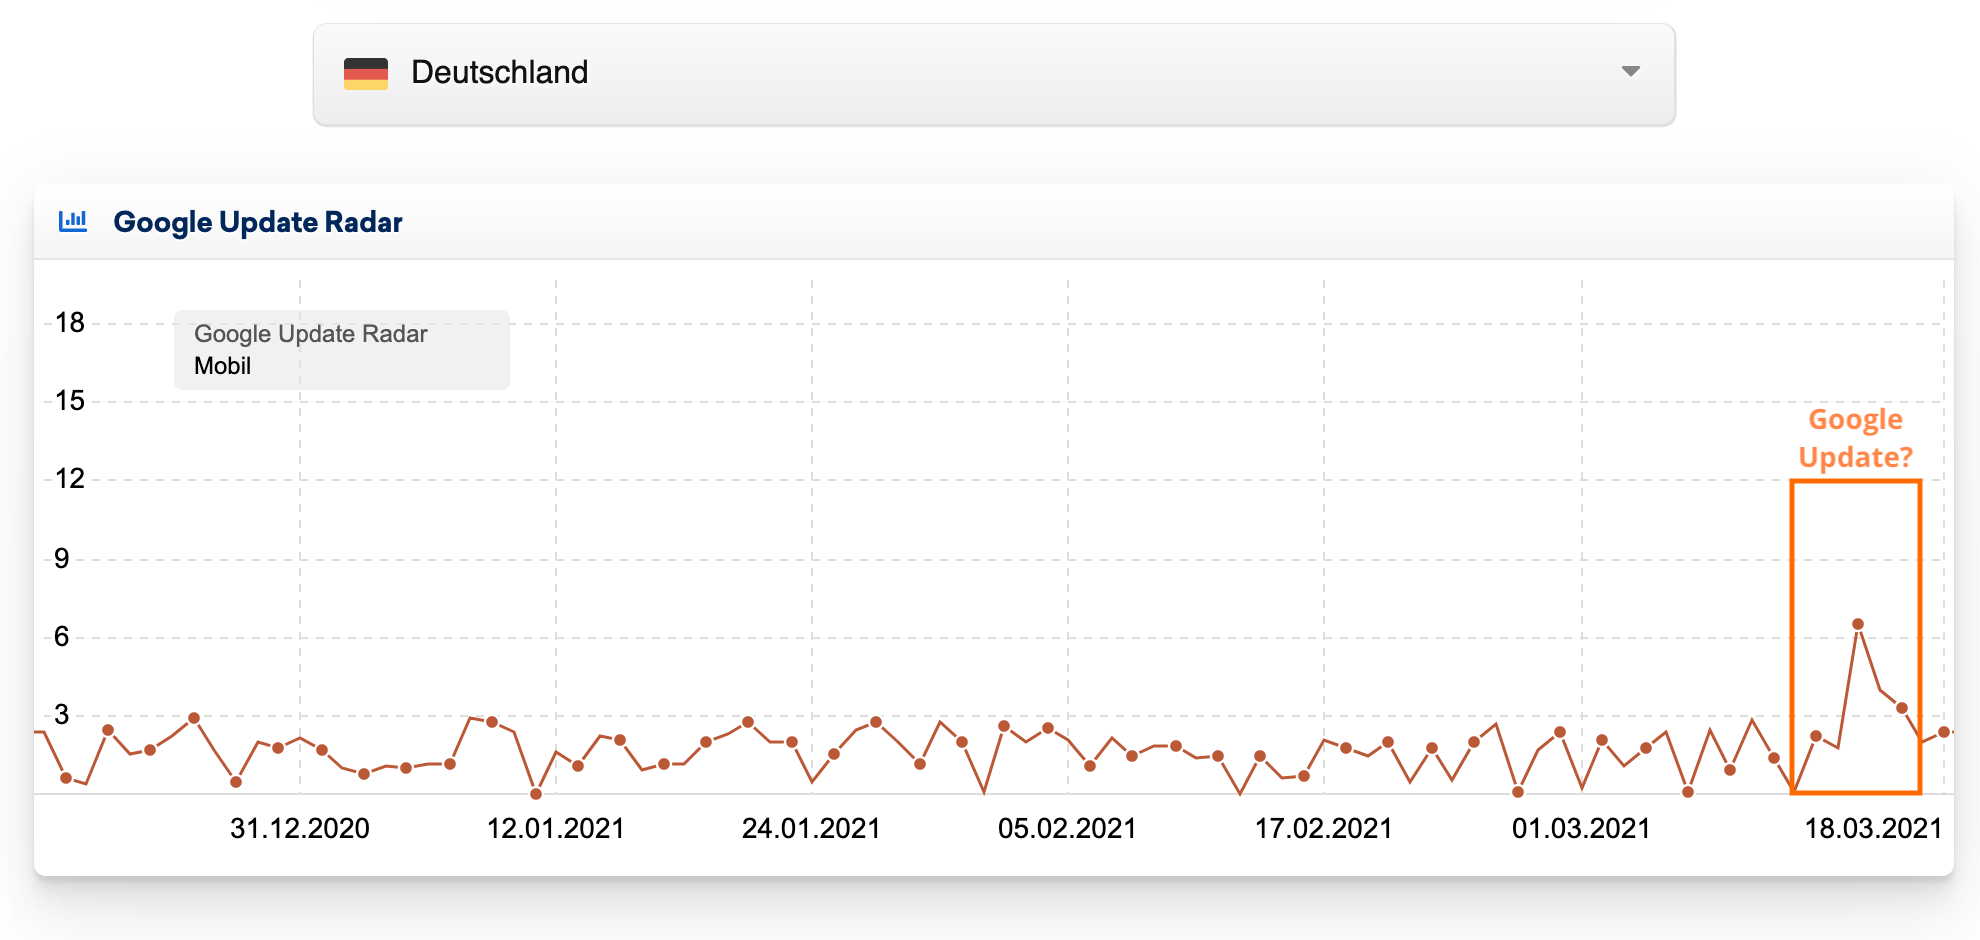 20210318: Google Update Radar // Sistrix